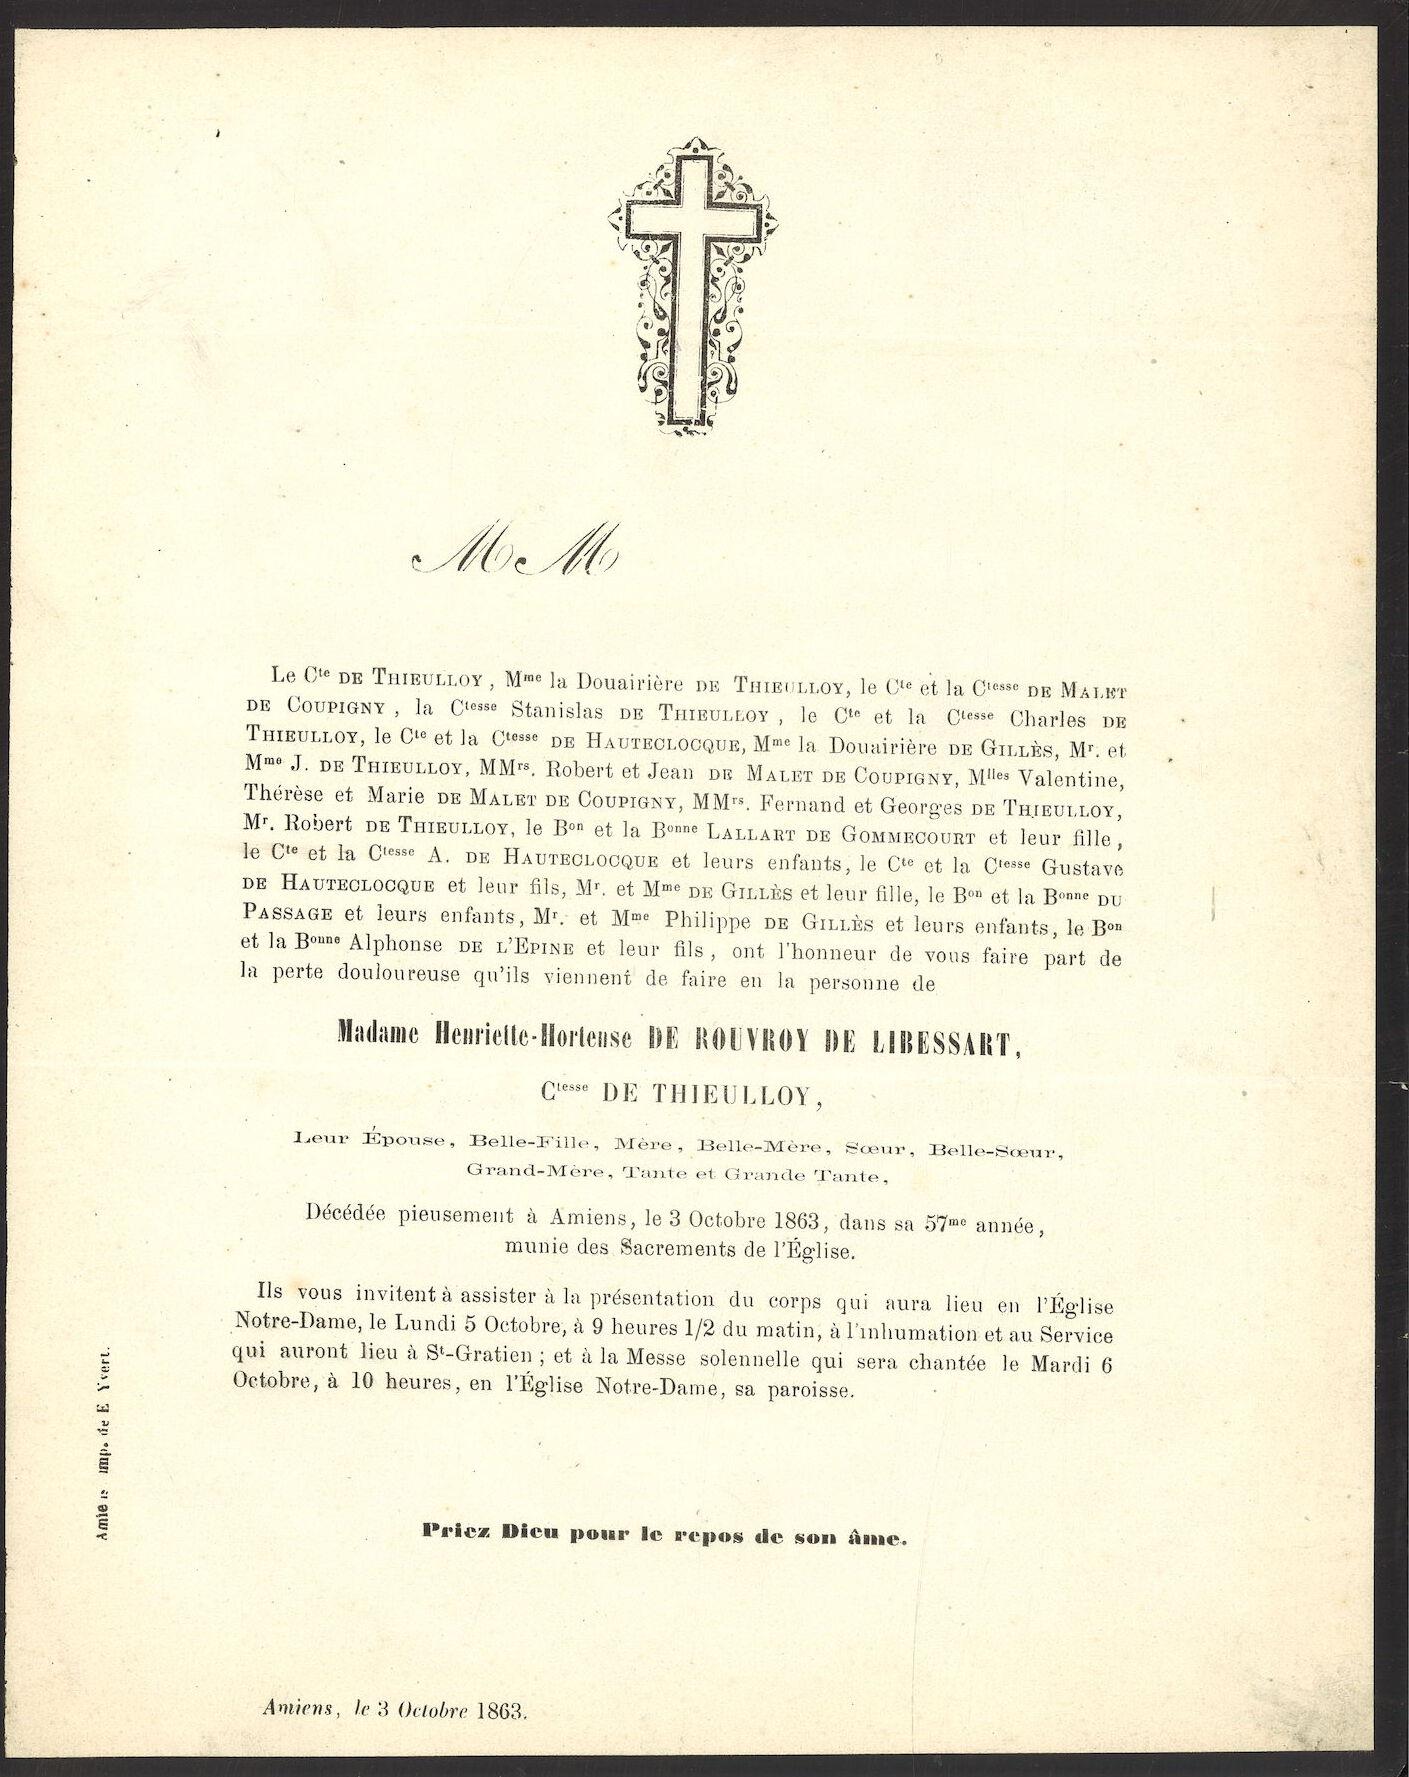 Henriette-Hortense De Rouvroy De Libessart